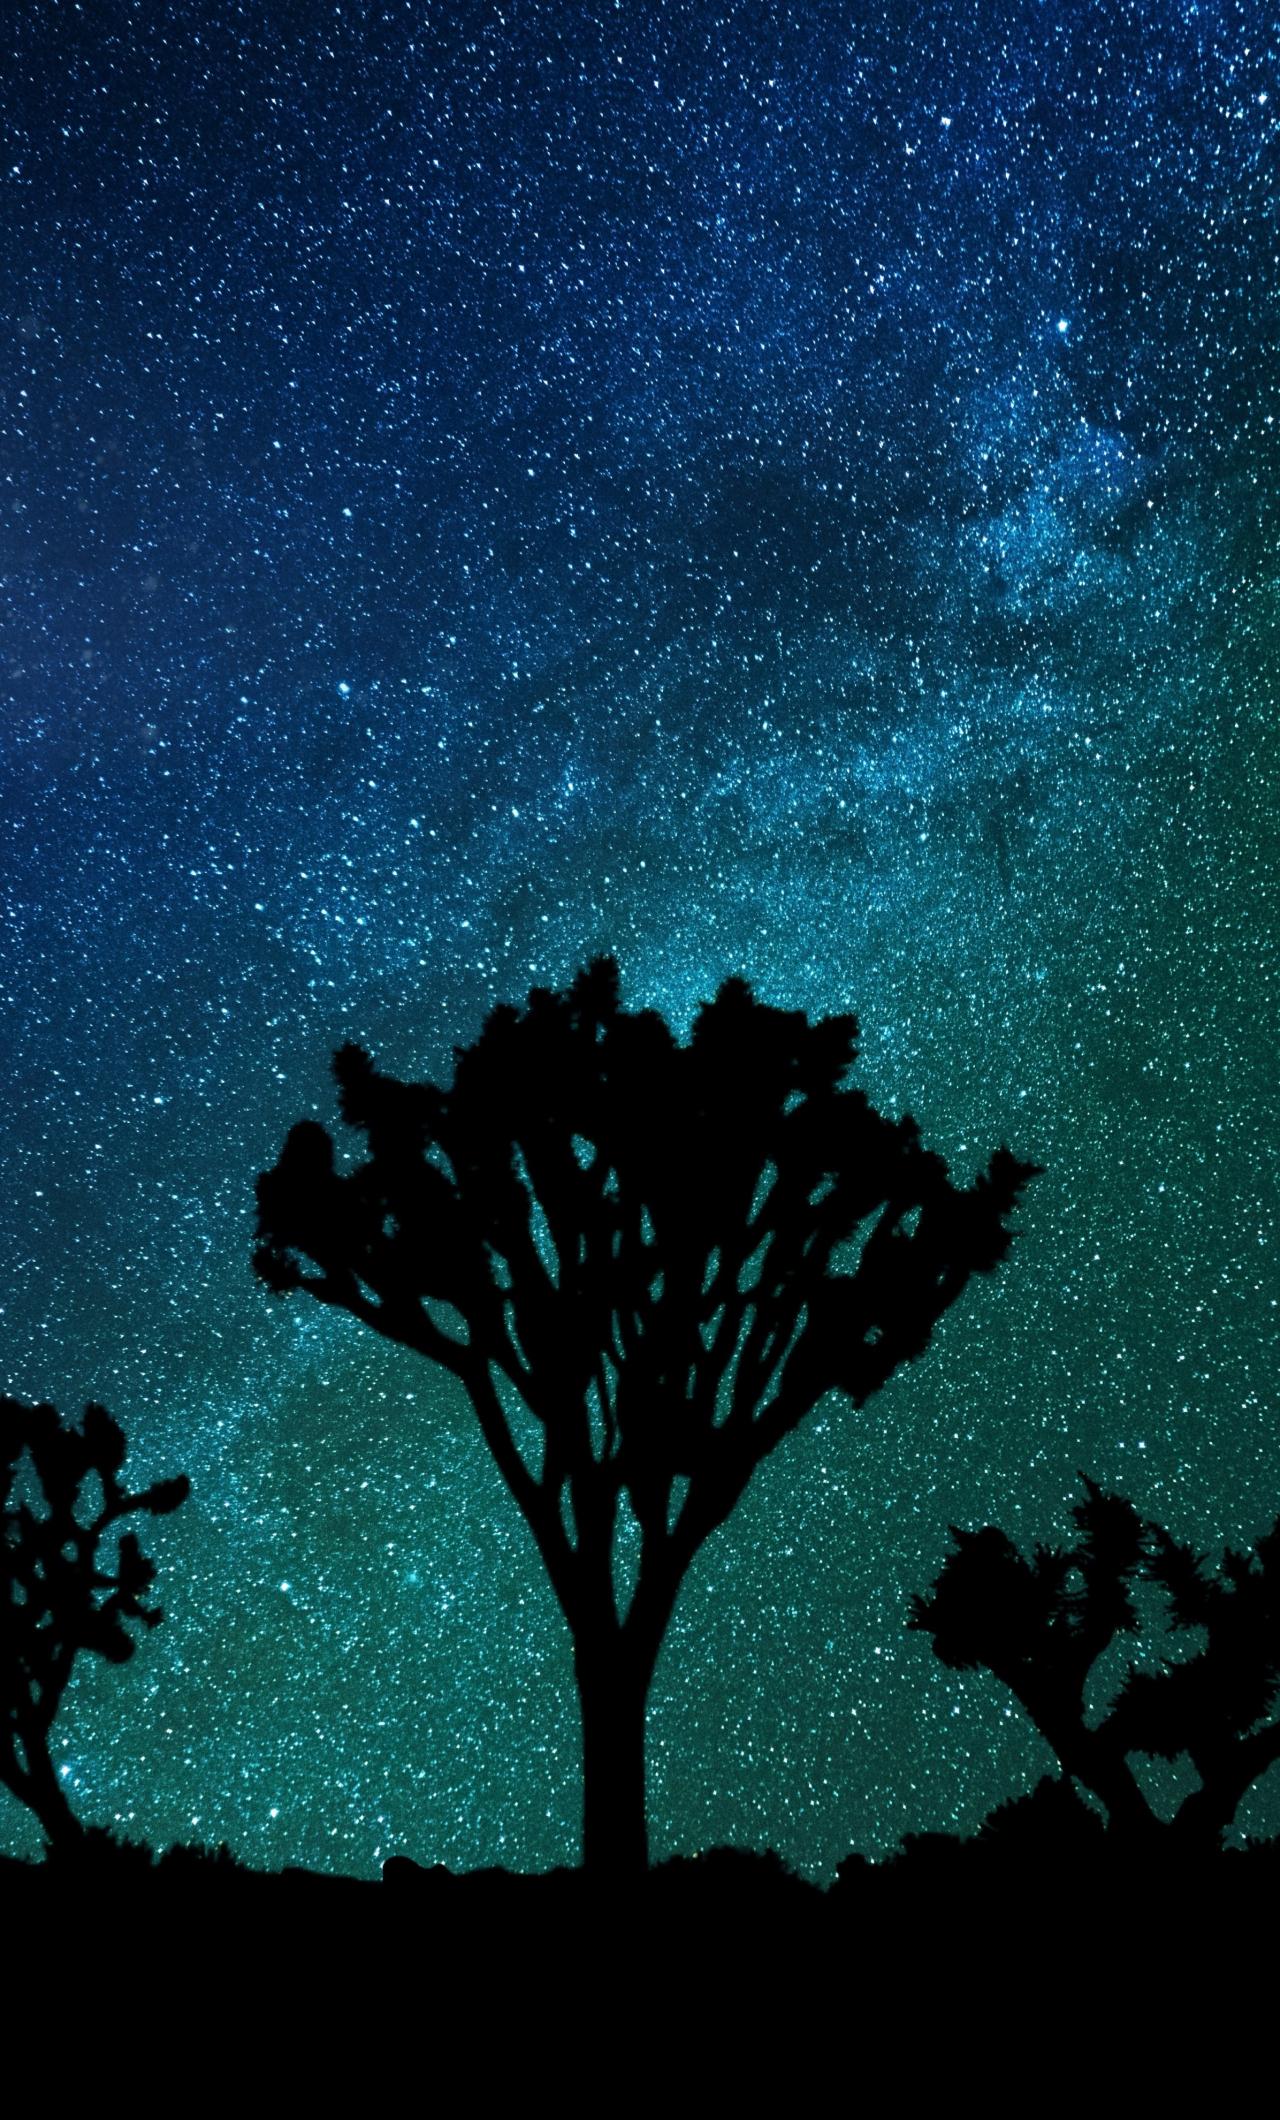 Download 1280x2120 Wallpaper Blue Green Sky Milky Way Joshua Tree Night Iphone 6 Plus 1280x2120 Hd Image Background 1336